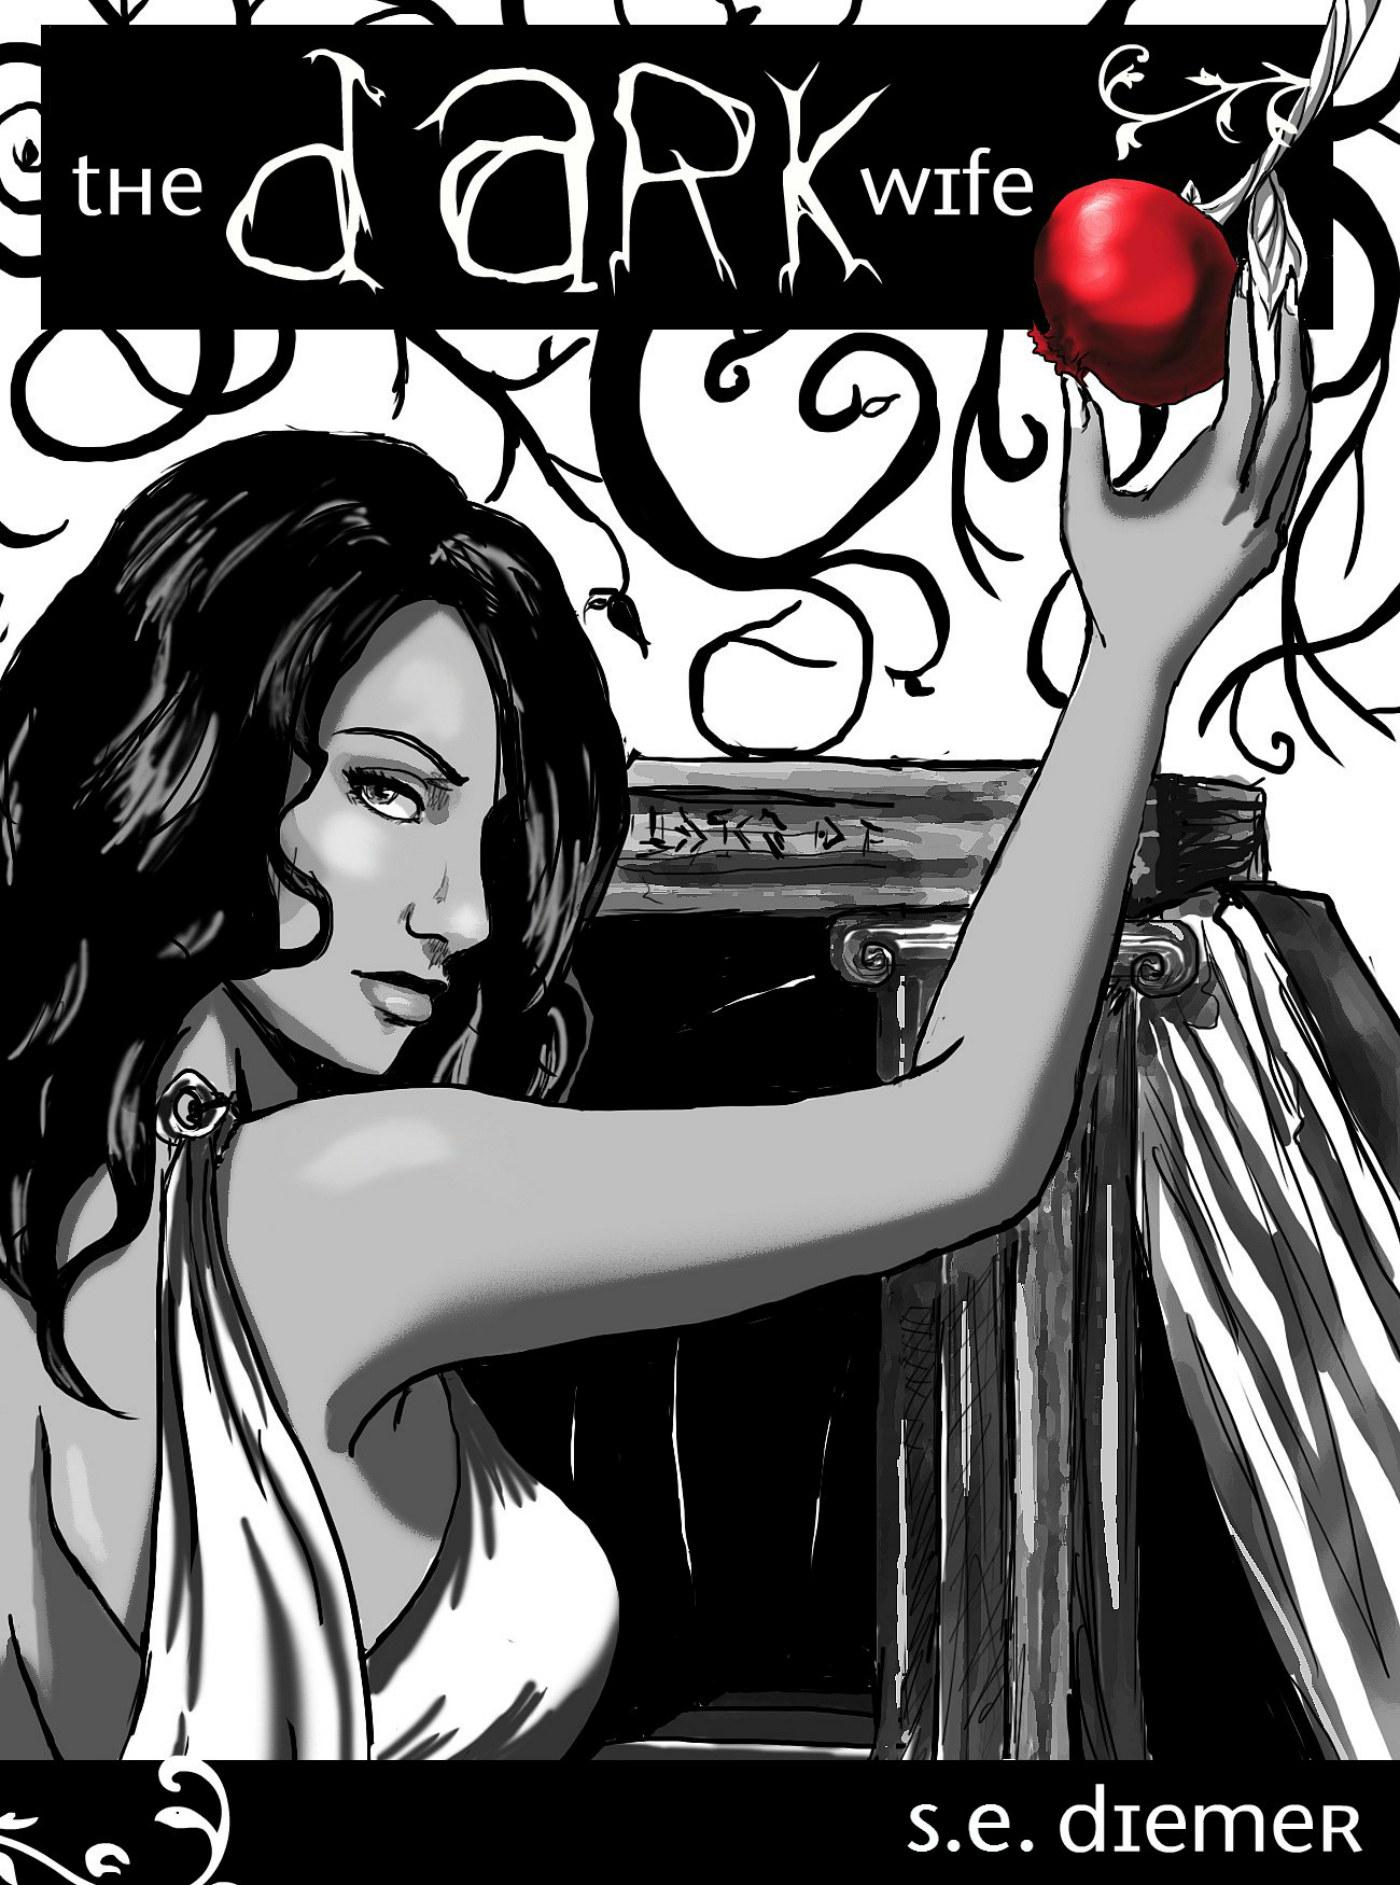 The Dark Wife cover. Book by Sarah Diemer.